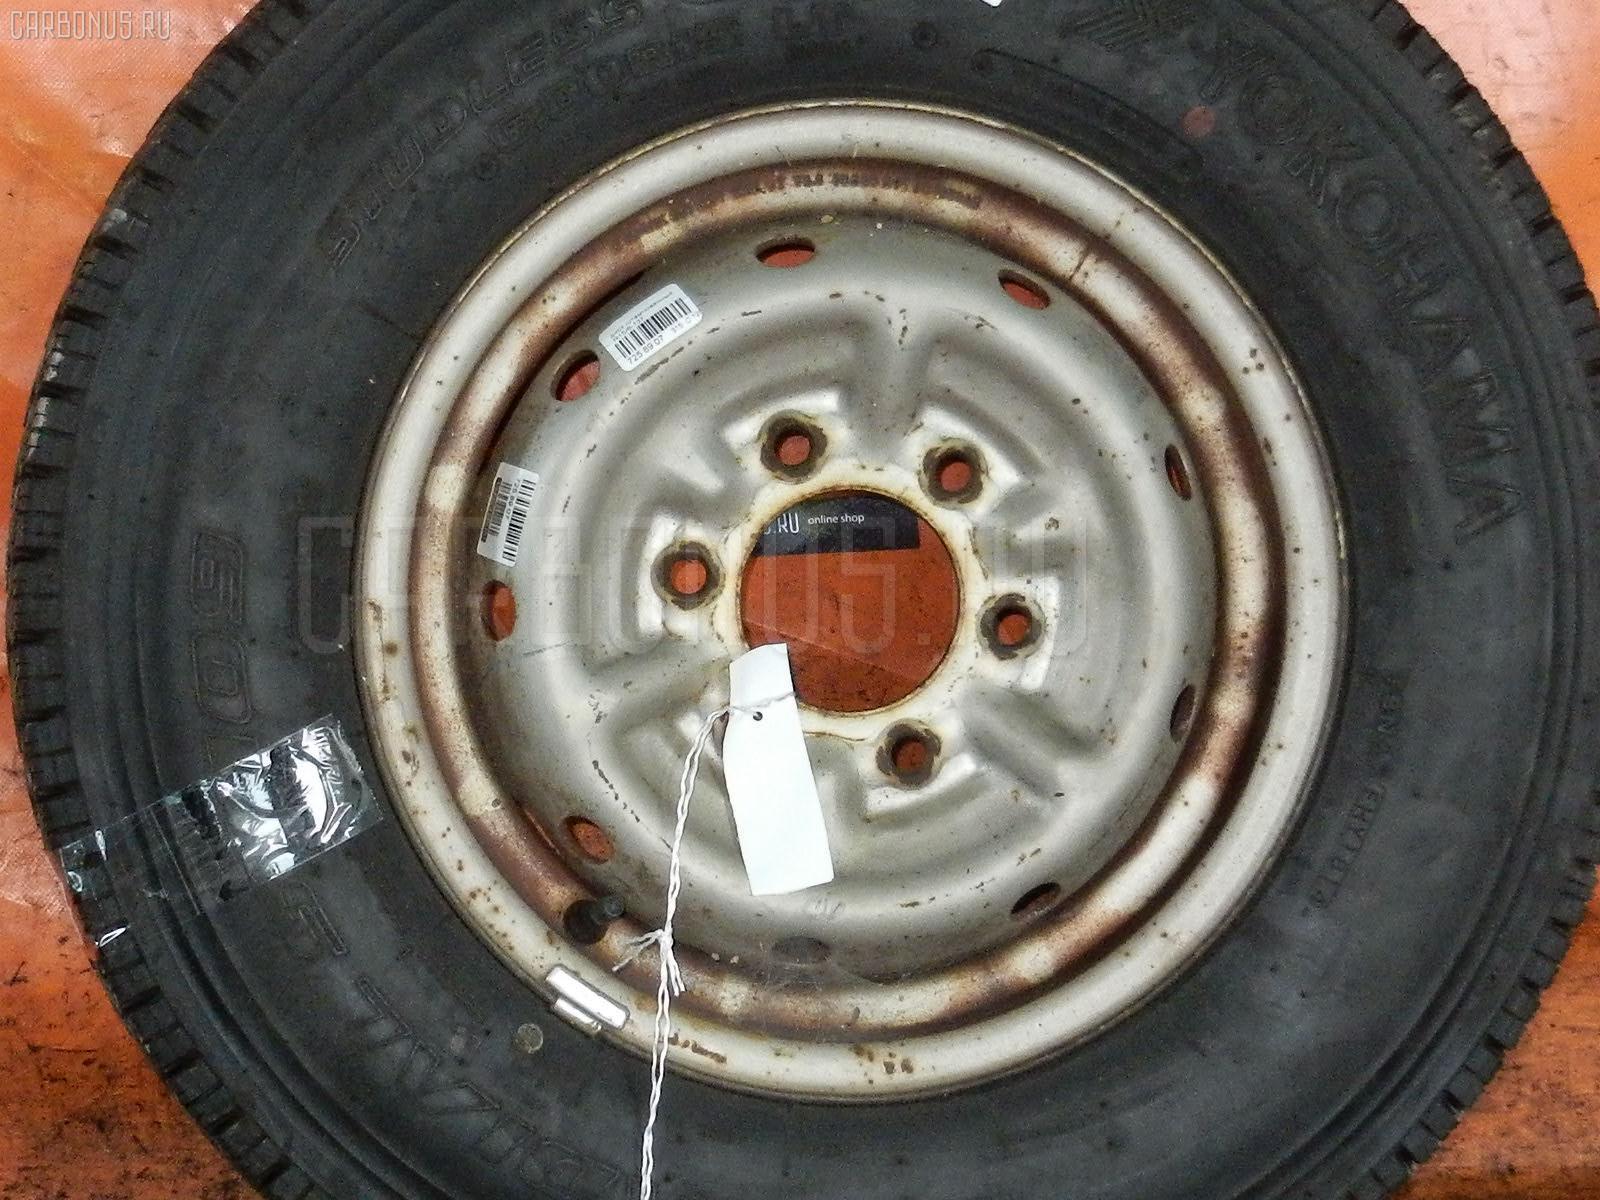 Диск штамповка грузовой R15LT / 6-139.7 Фото 1